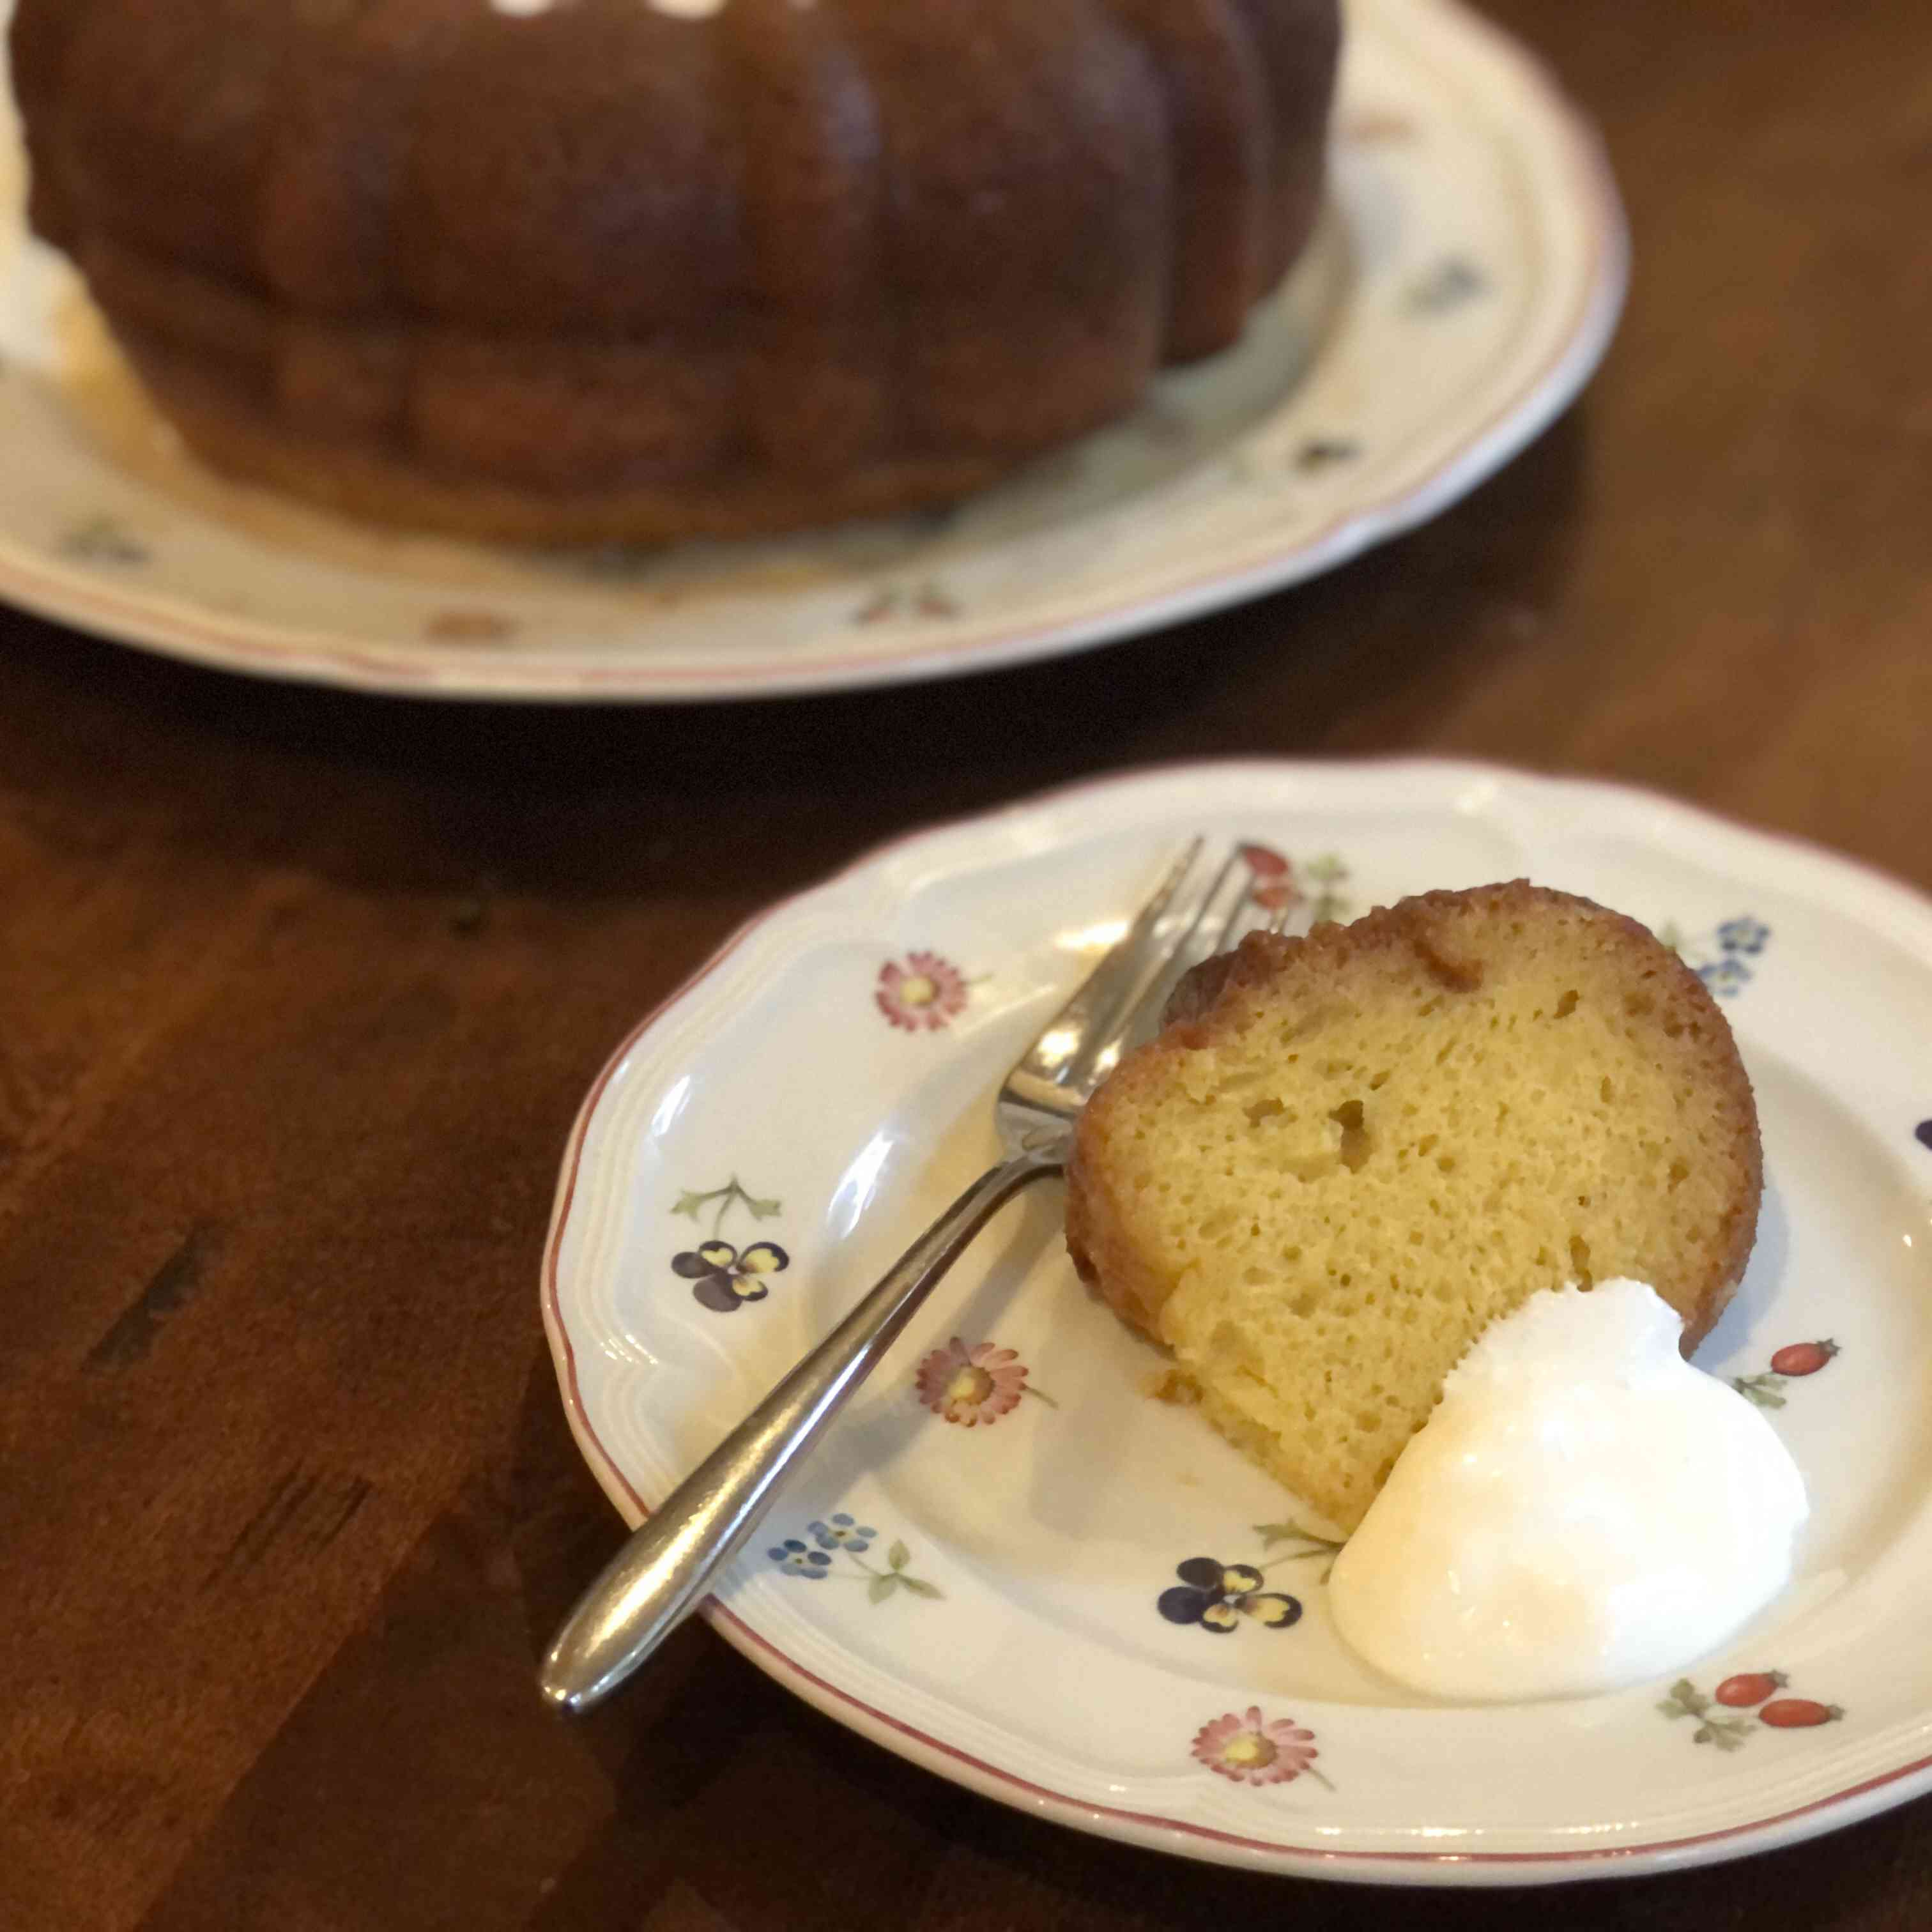 Bacardi Rum Soaked Cake Tester Image